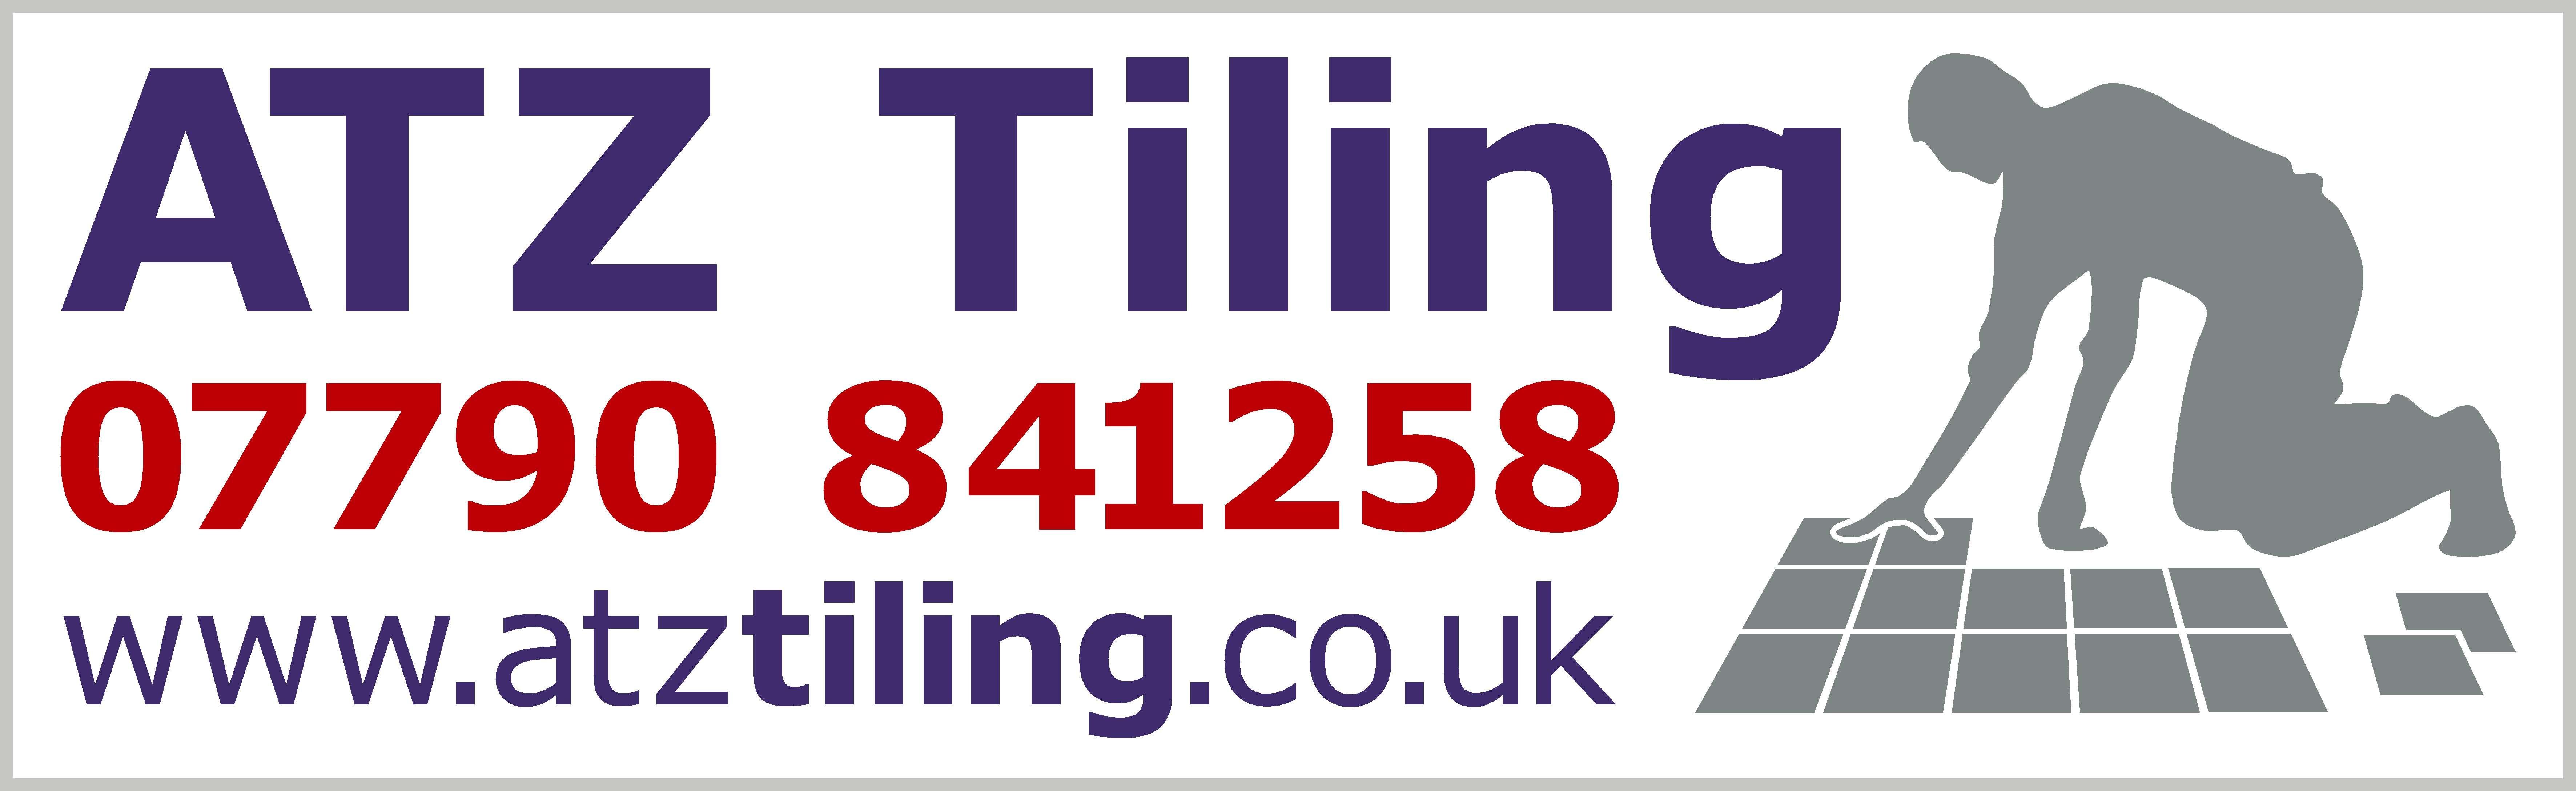 ATZ Tiling